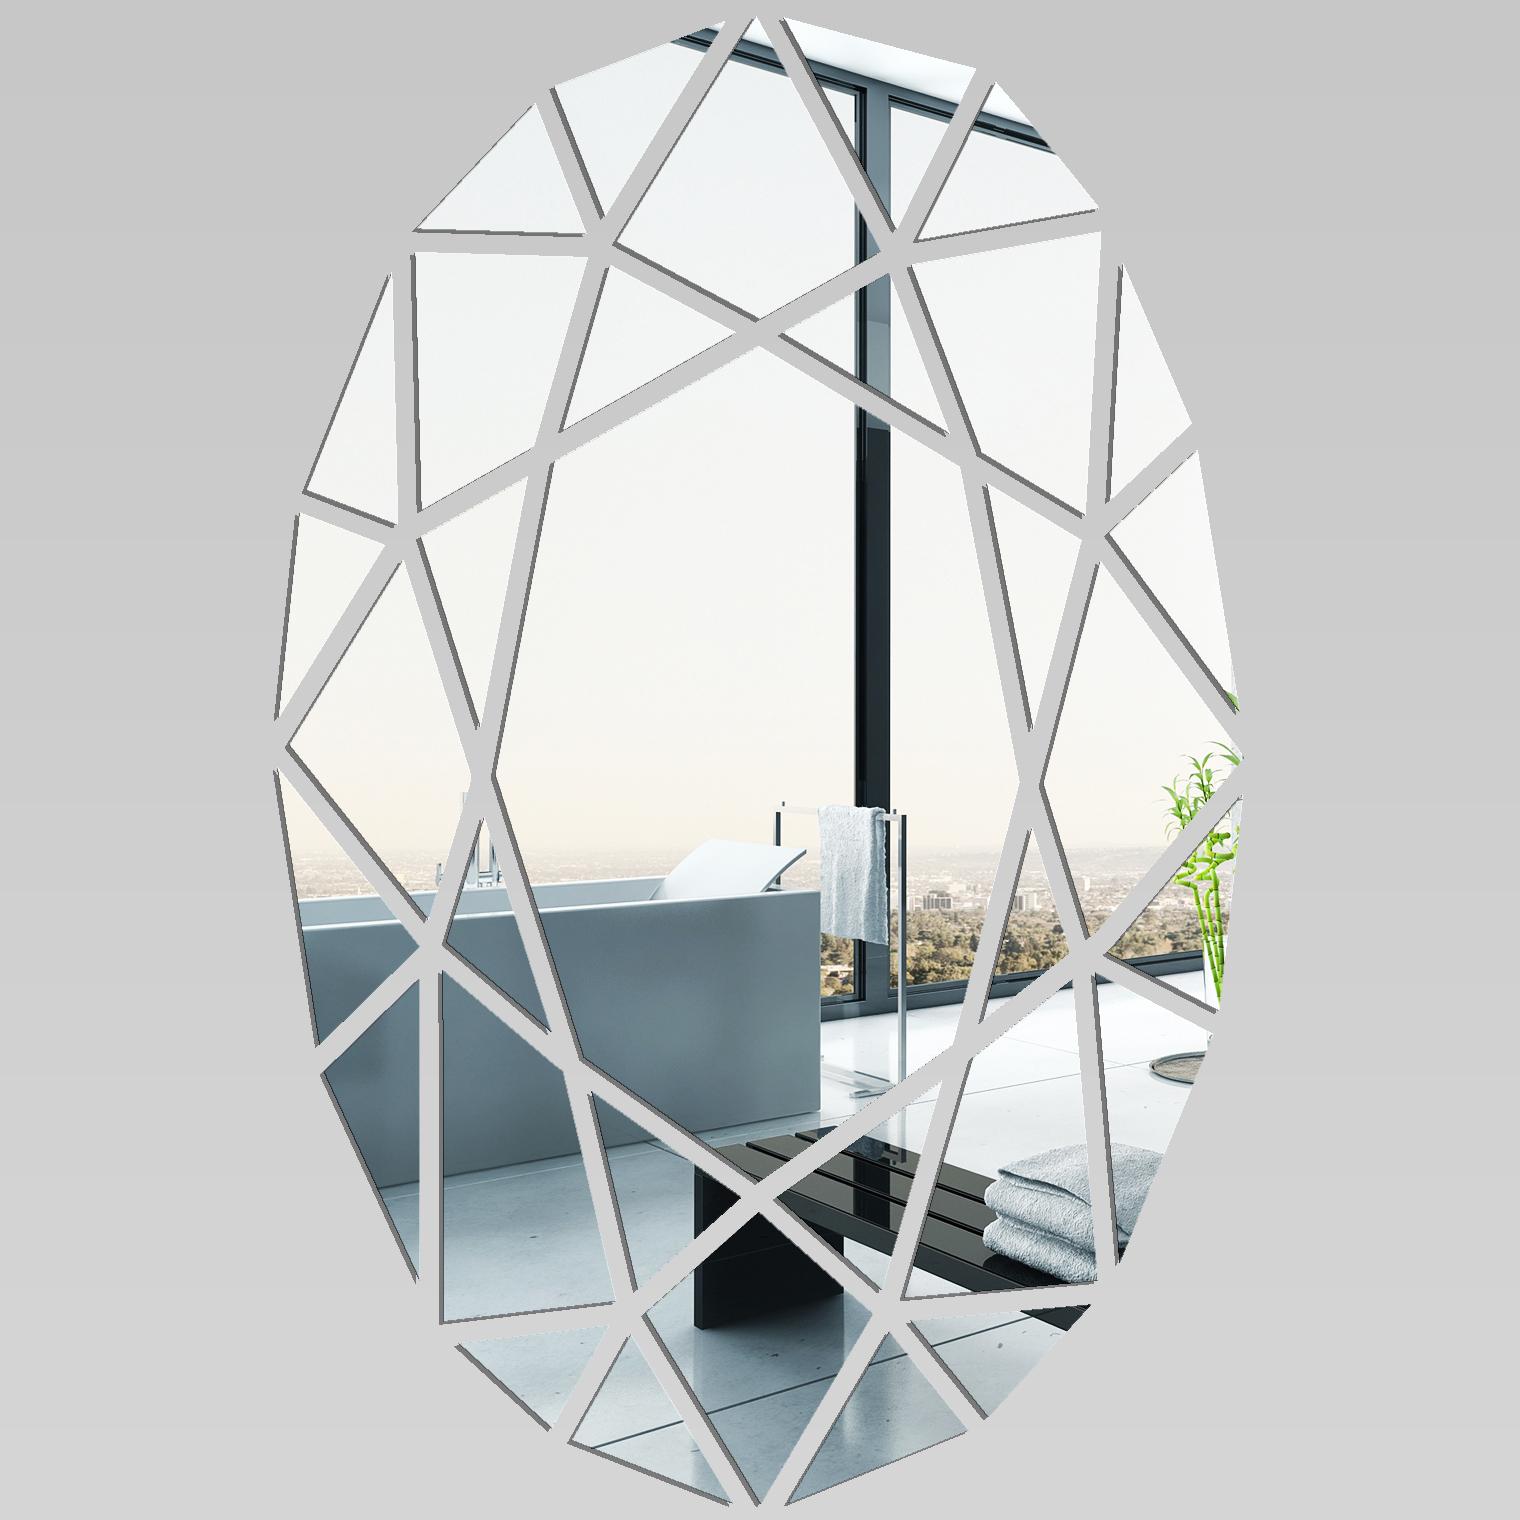 espejos decorativo acrlico plxiglas mosaico